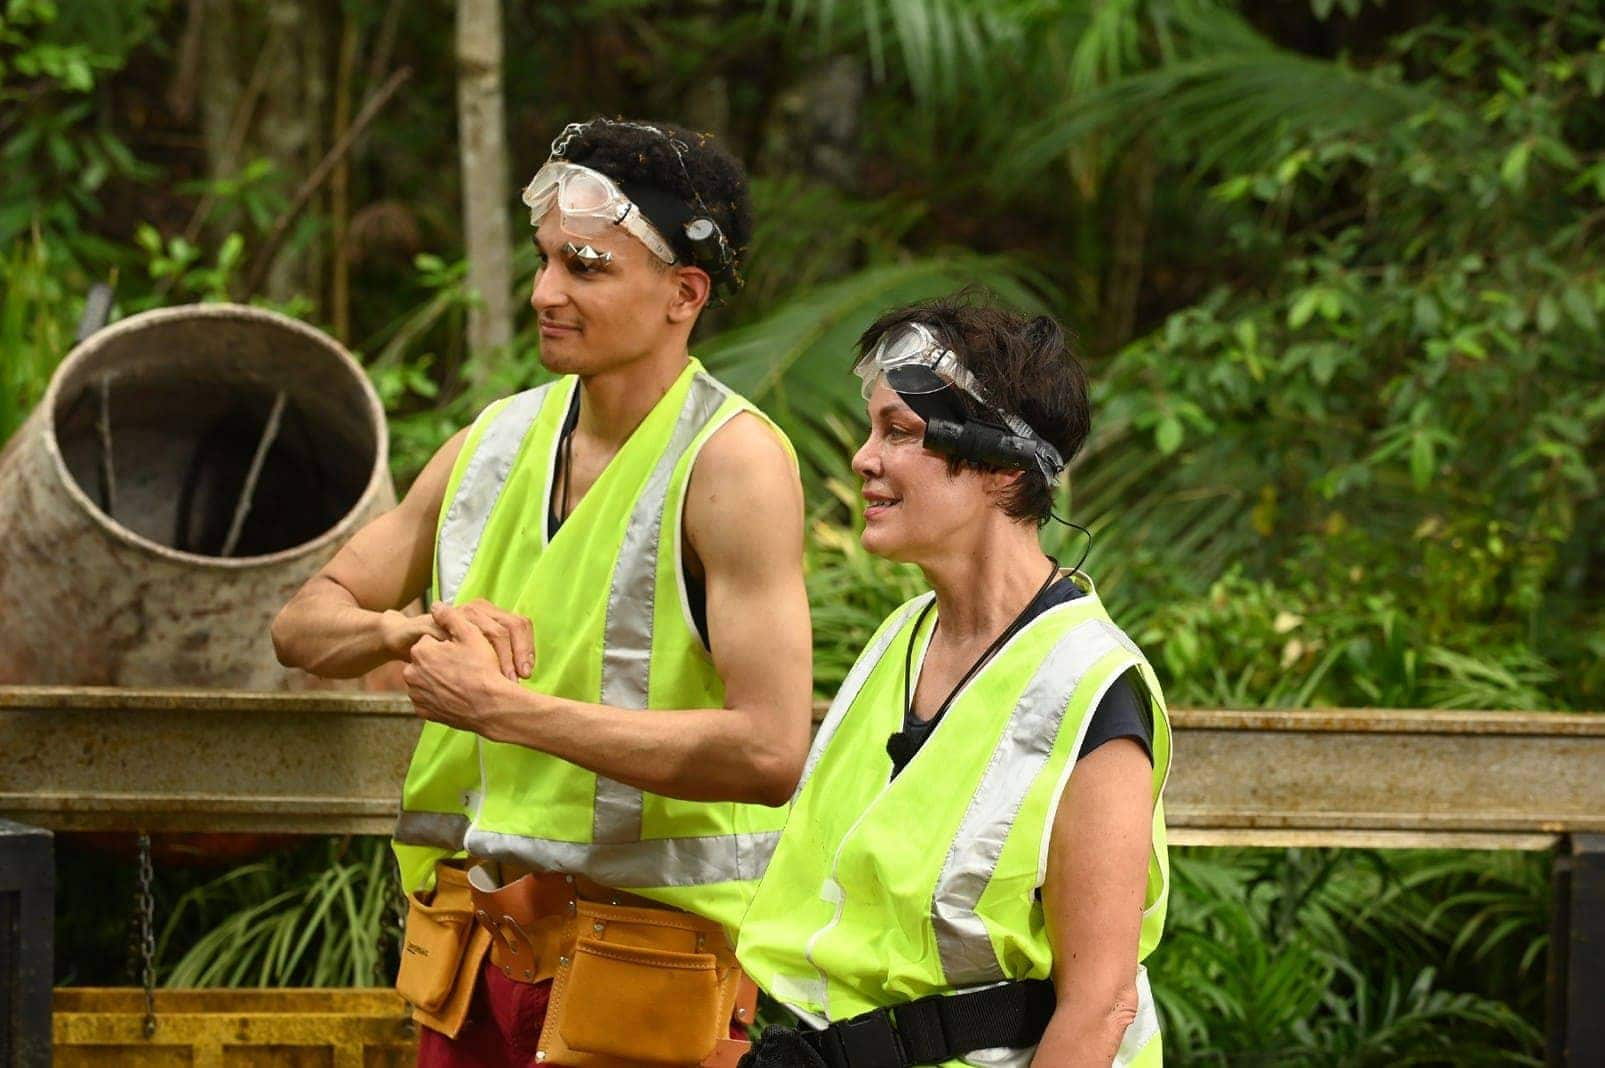 Dschungelcamp 2020 Tag 10 Dschungelprüfung Prince Damien Sonja Kirchberger